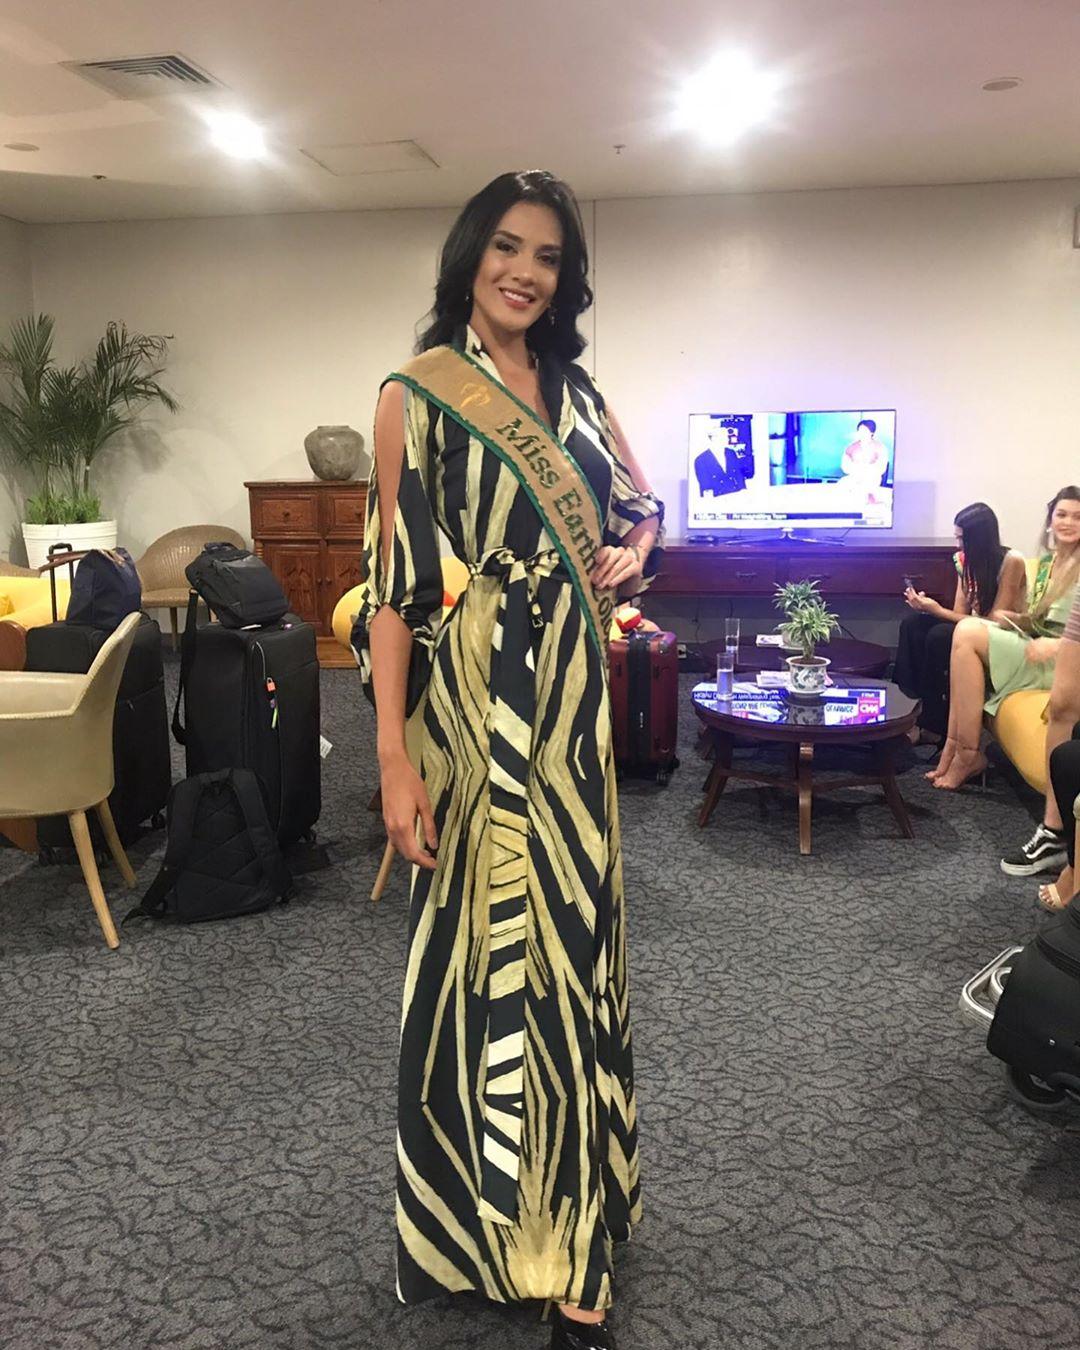 yenny katherine carrillo, top 20 de miss earth 2019/reyna mundial banano 2017. - Página 6 70857510